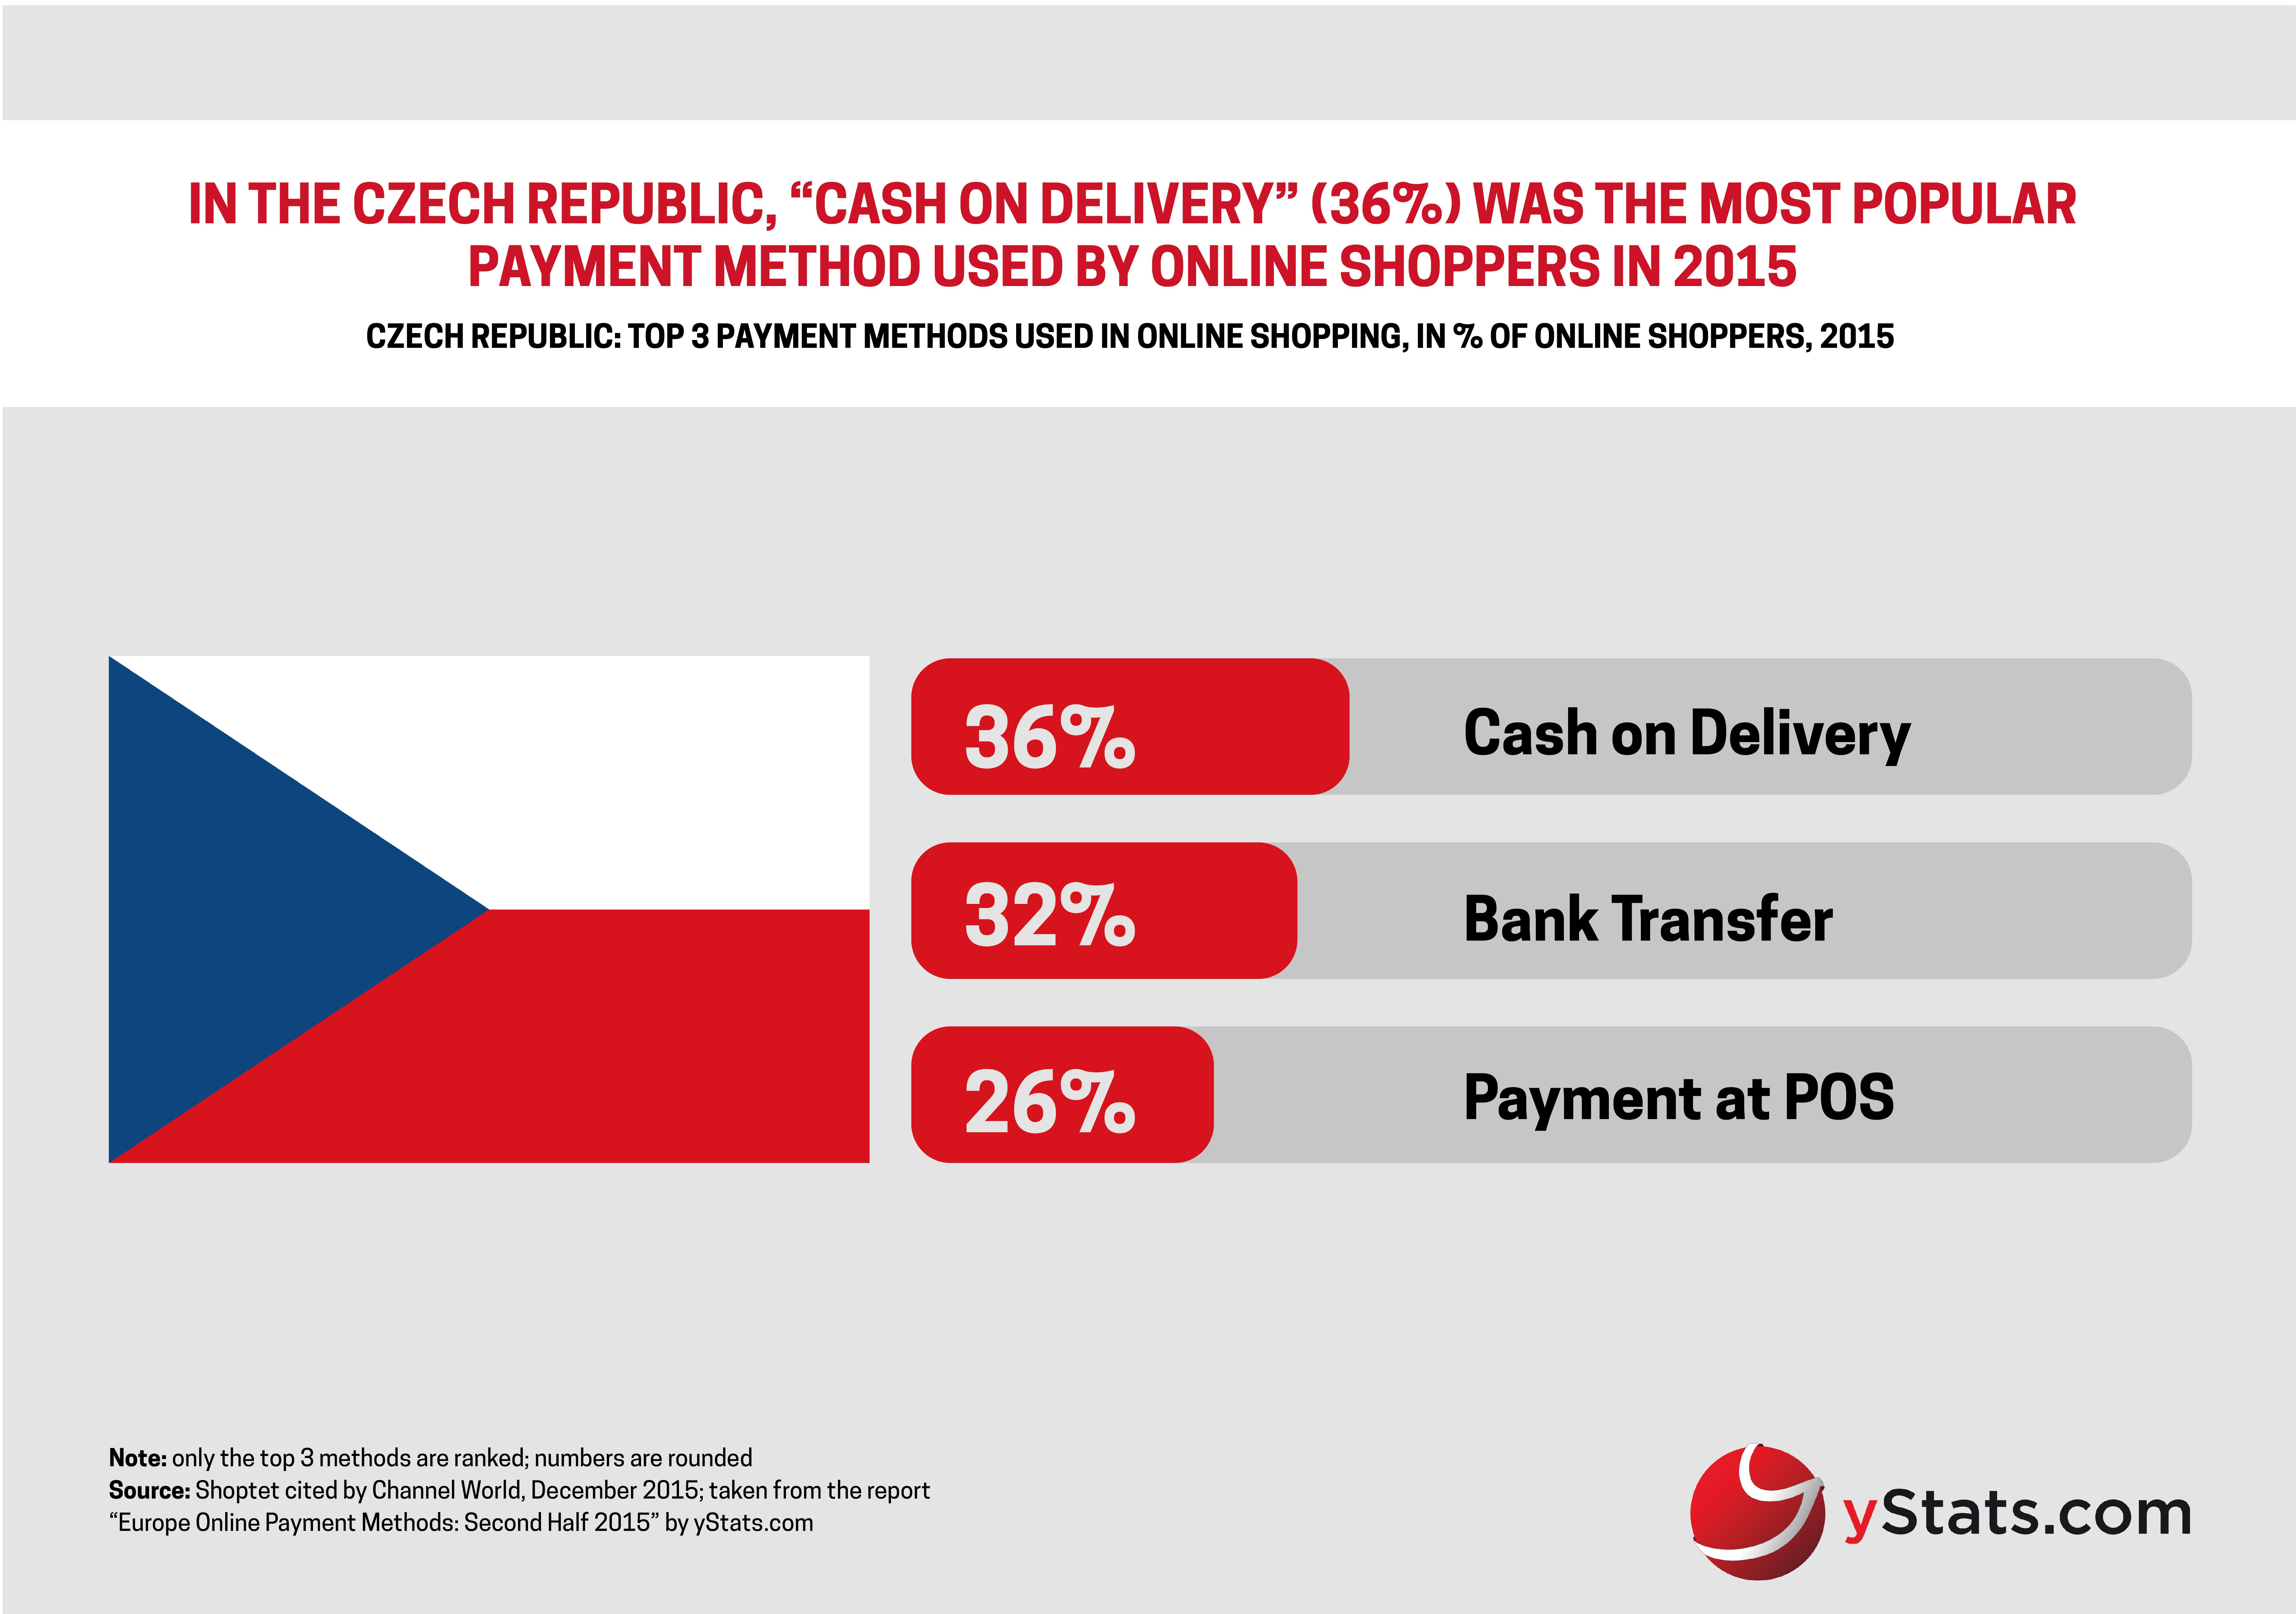 1533b8f1e78 yStats.com Infographic Europe Online Payment Methods Second Half 2015